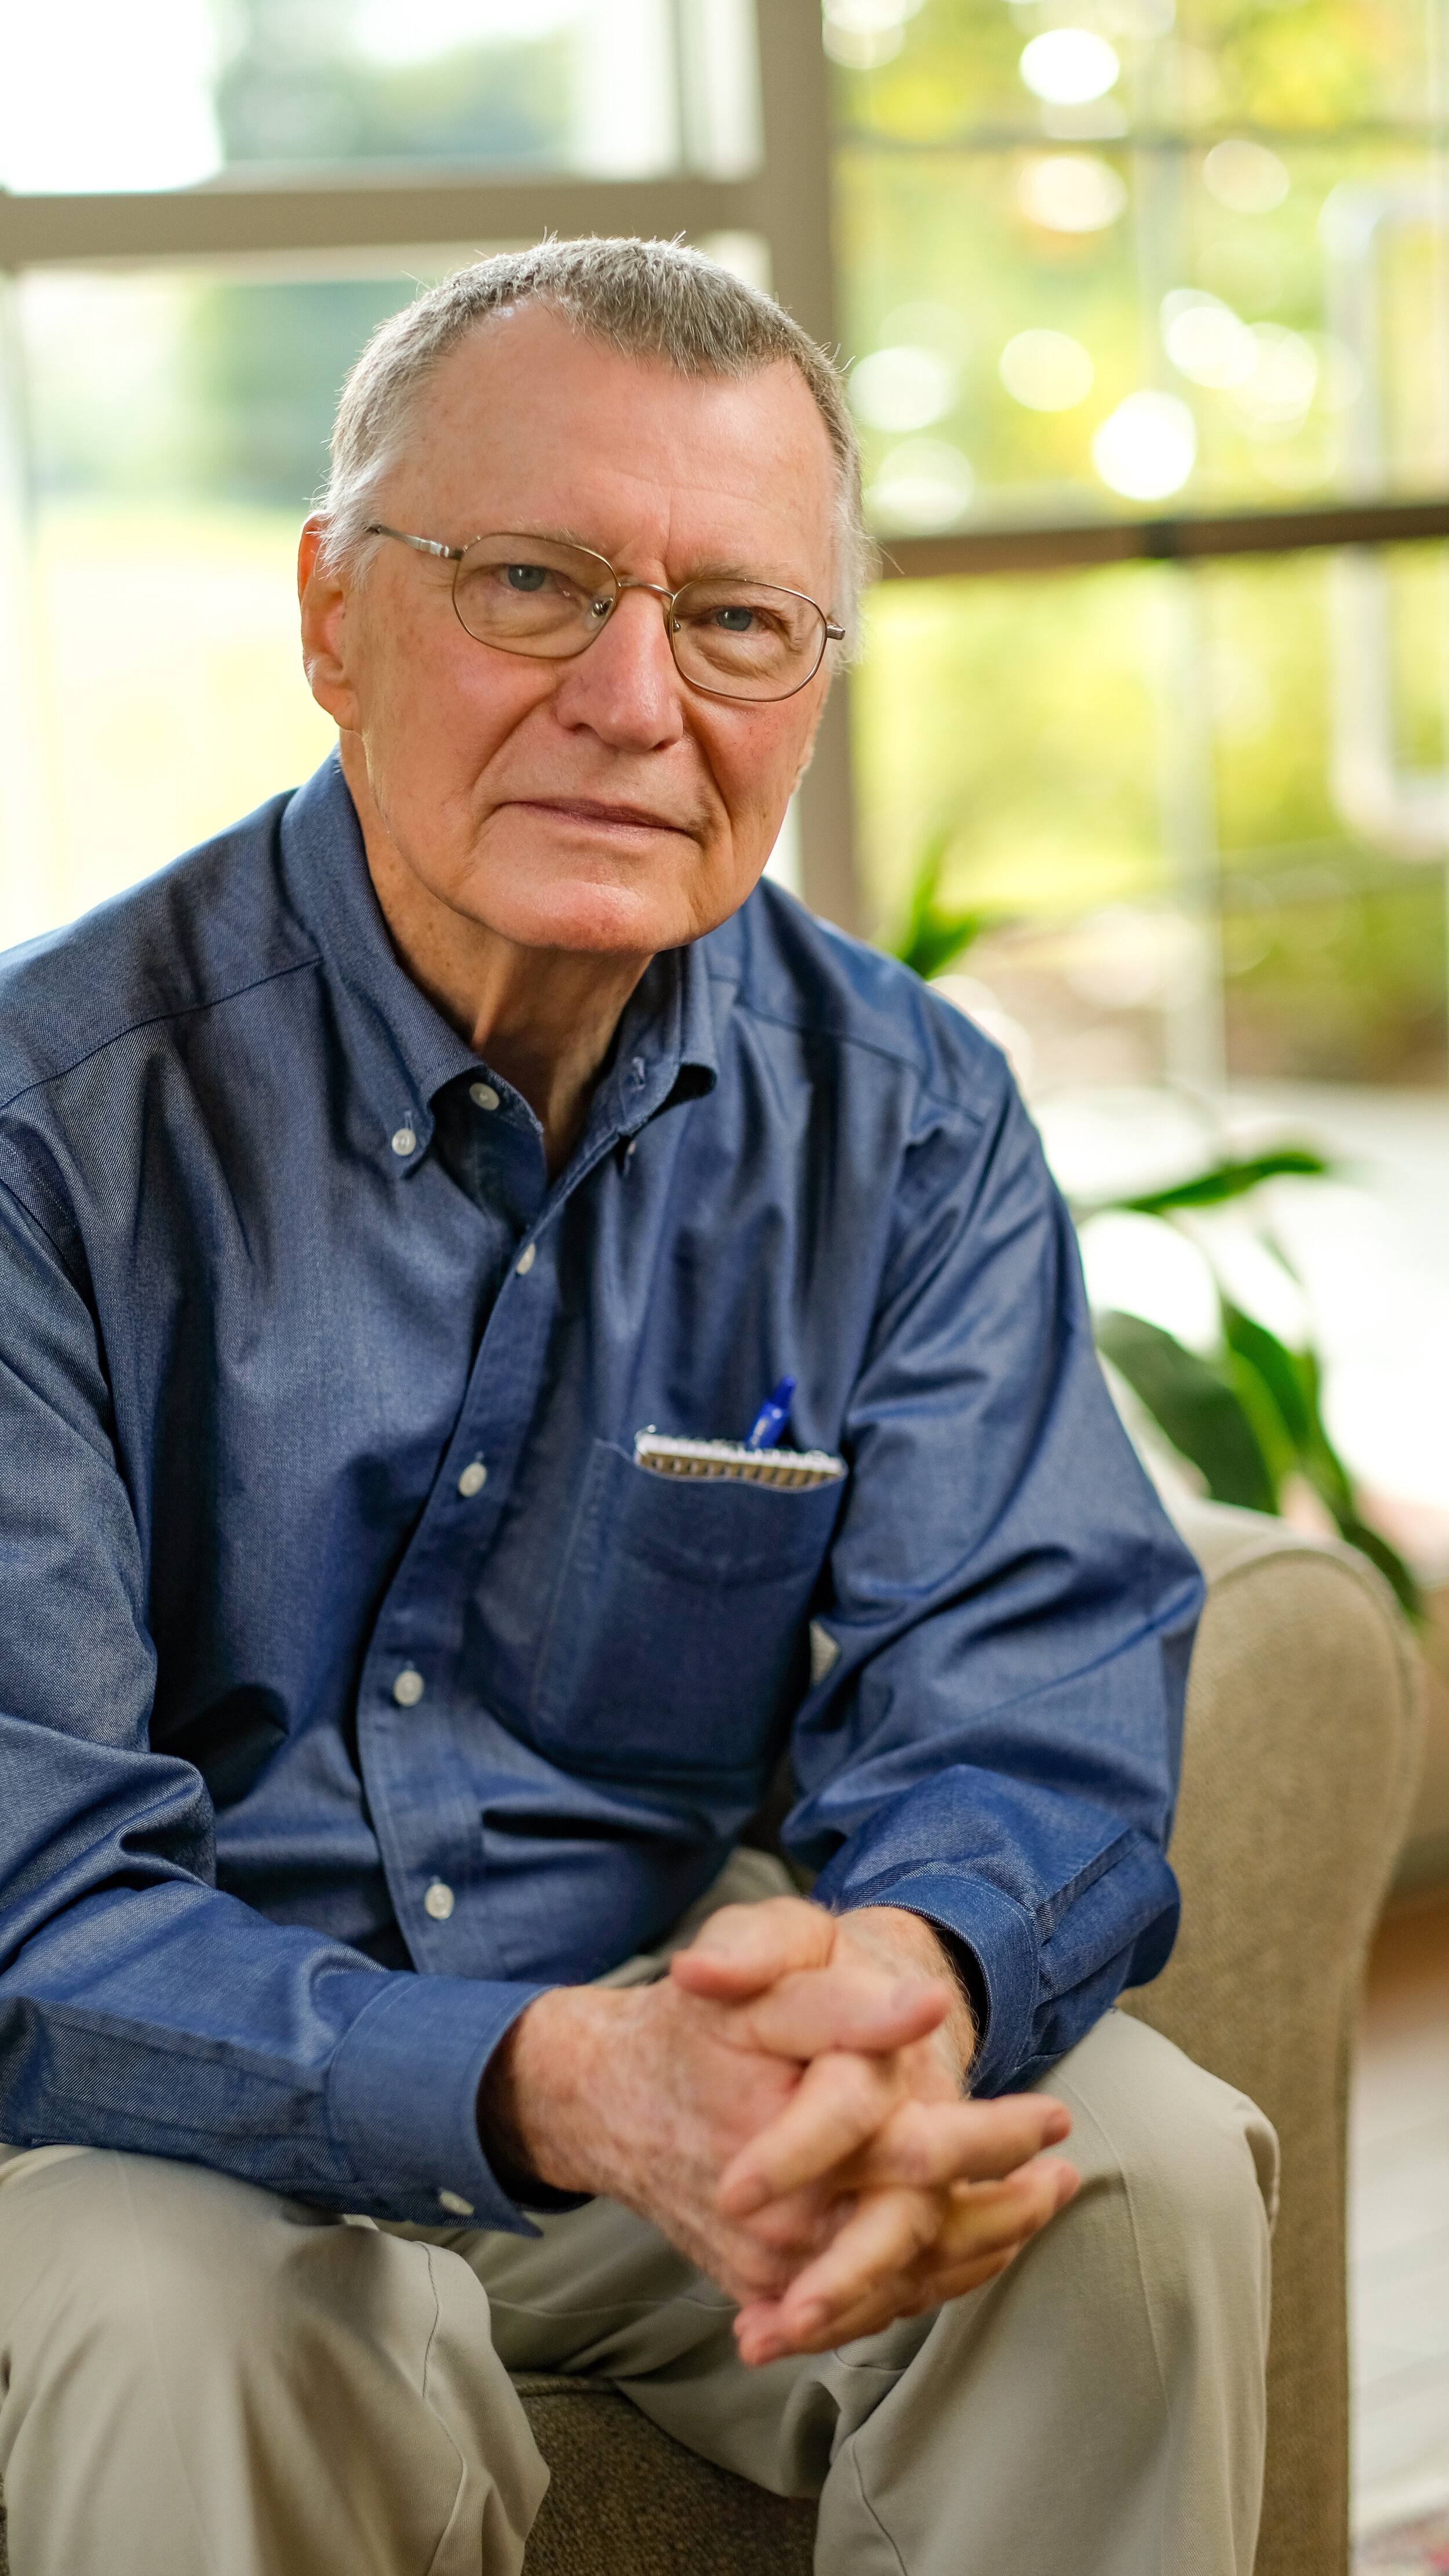 Woody Markert, assistant pastor